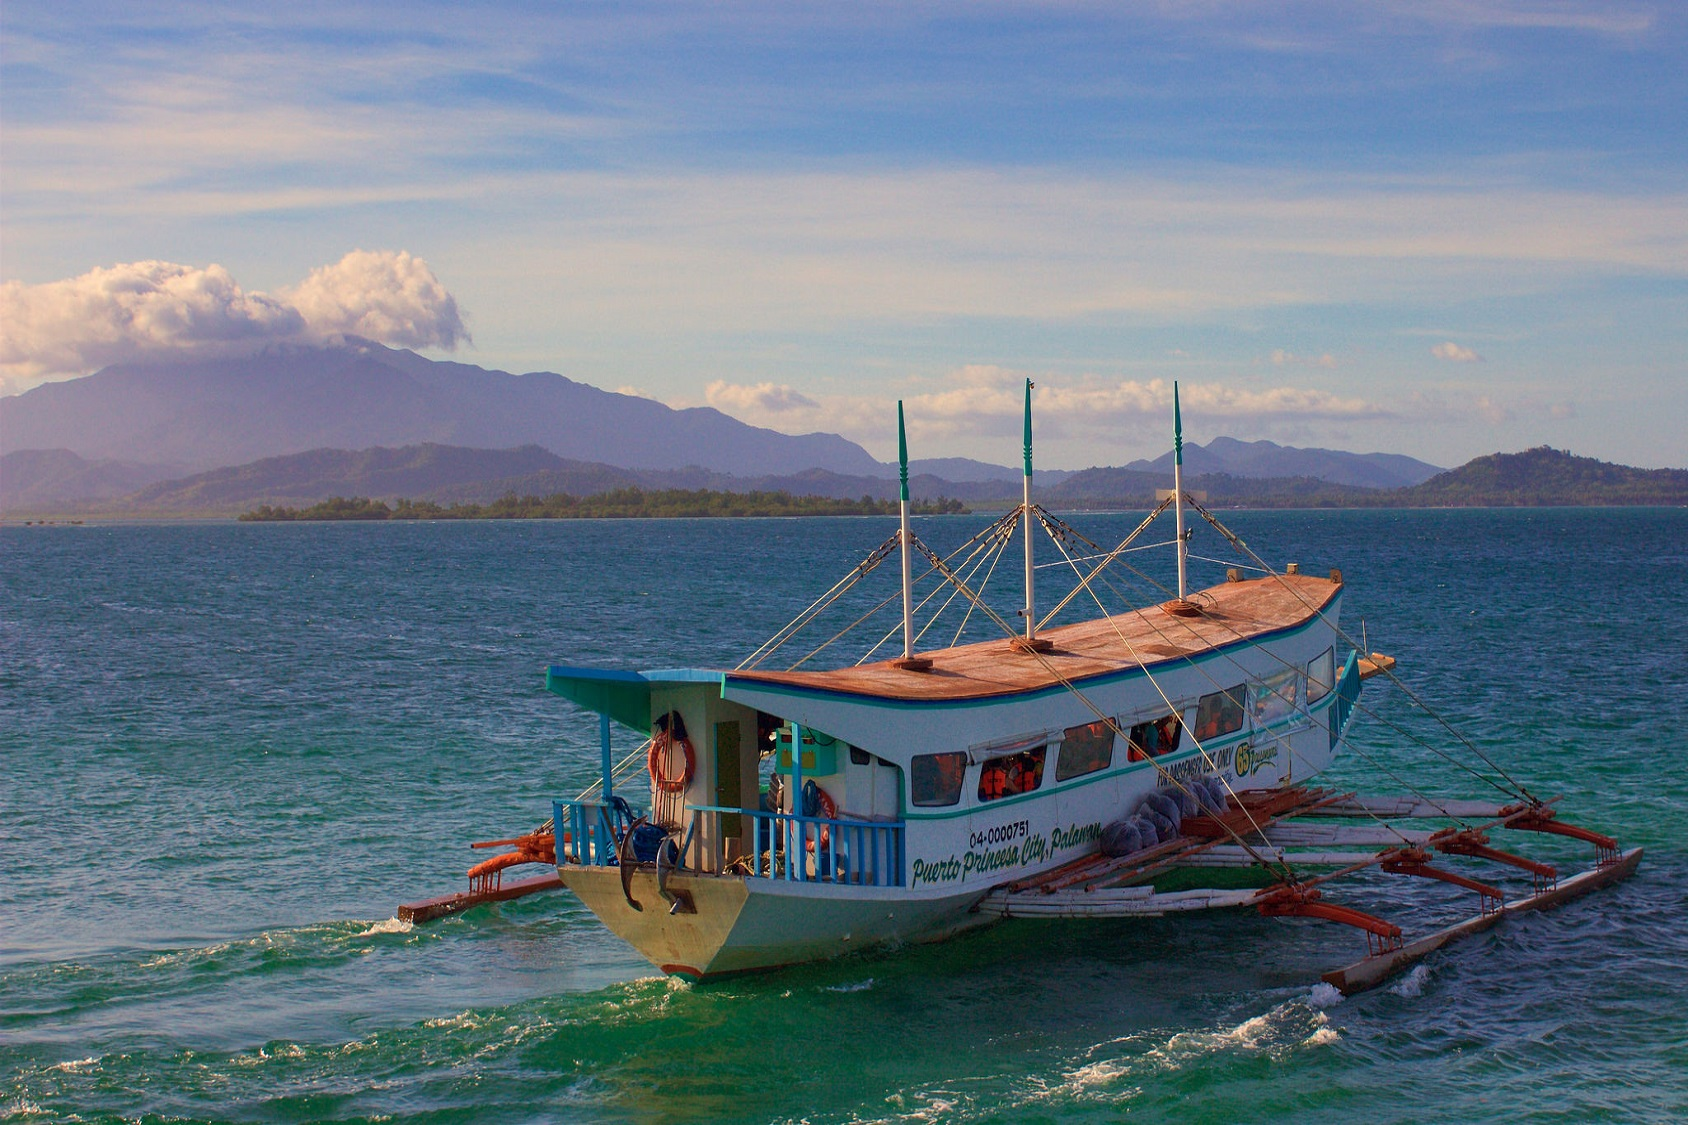 Ferry Service Palawan Slow Boat, Banca, El Nido, Coron, Outrigger Boat